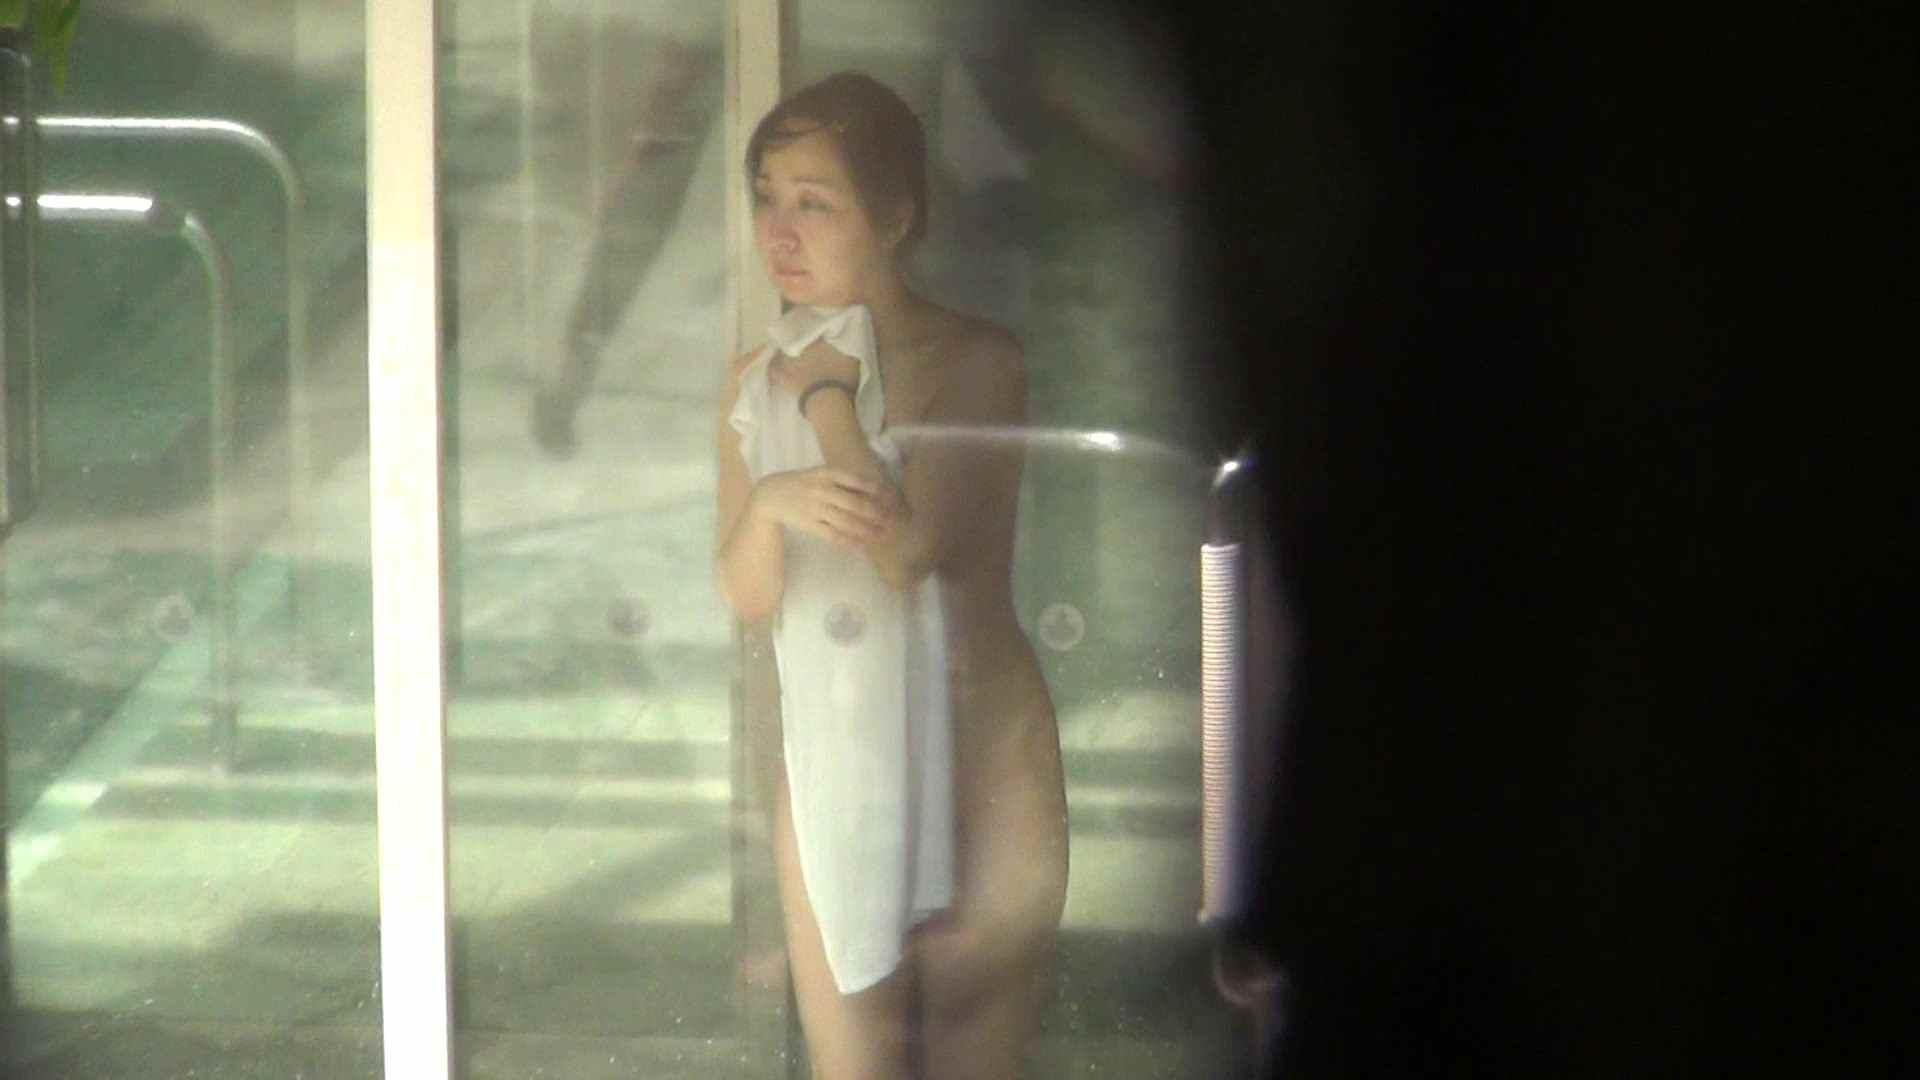 Aquaな露天風呂Vol.308 露天 | 盗撮特撮  12pic 1